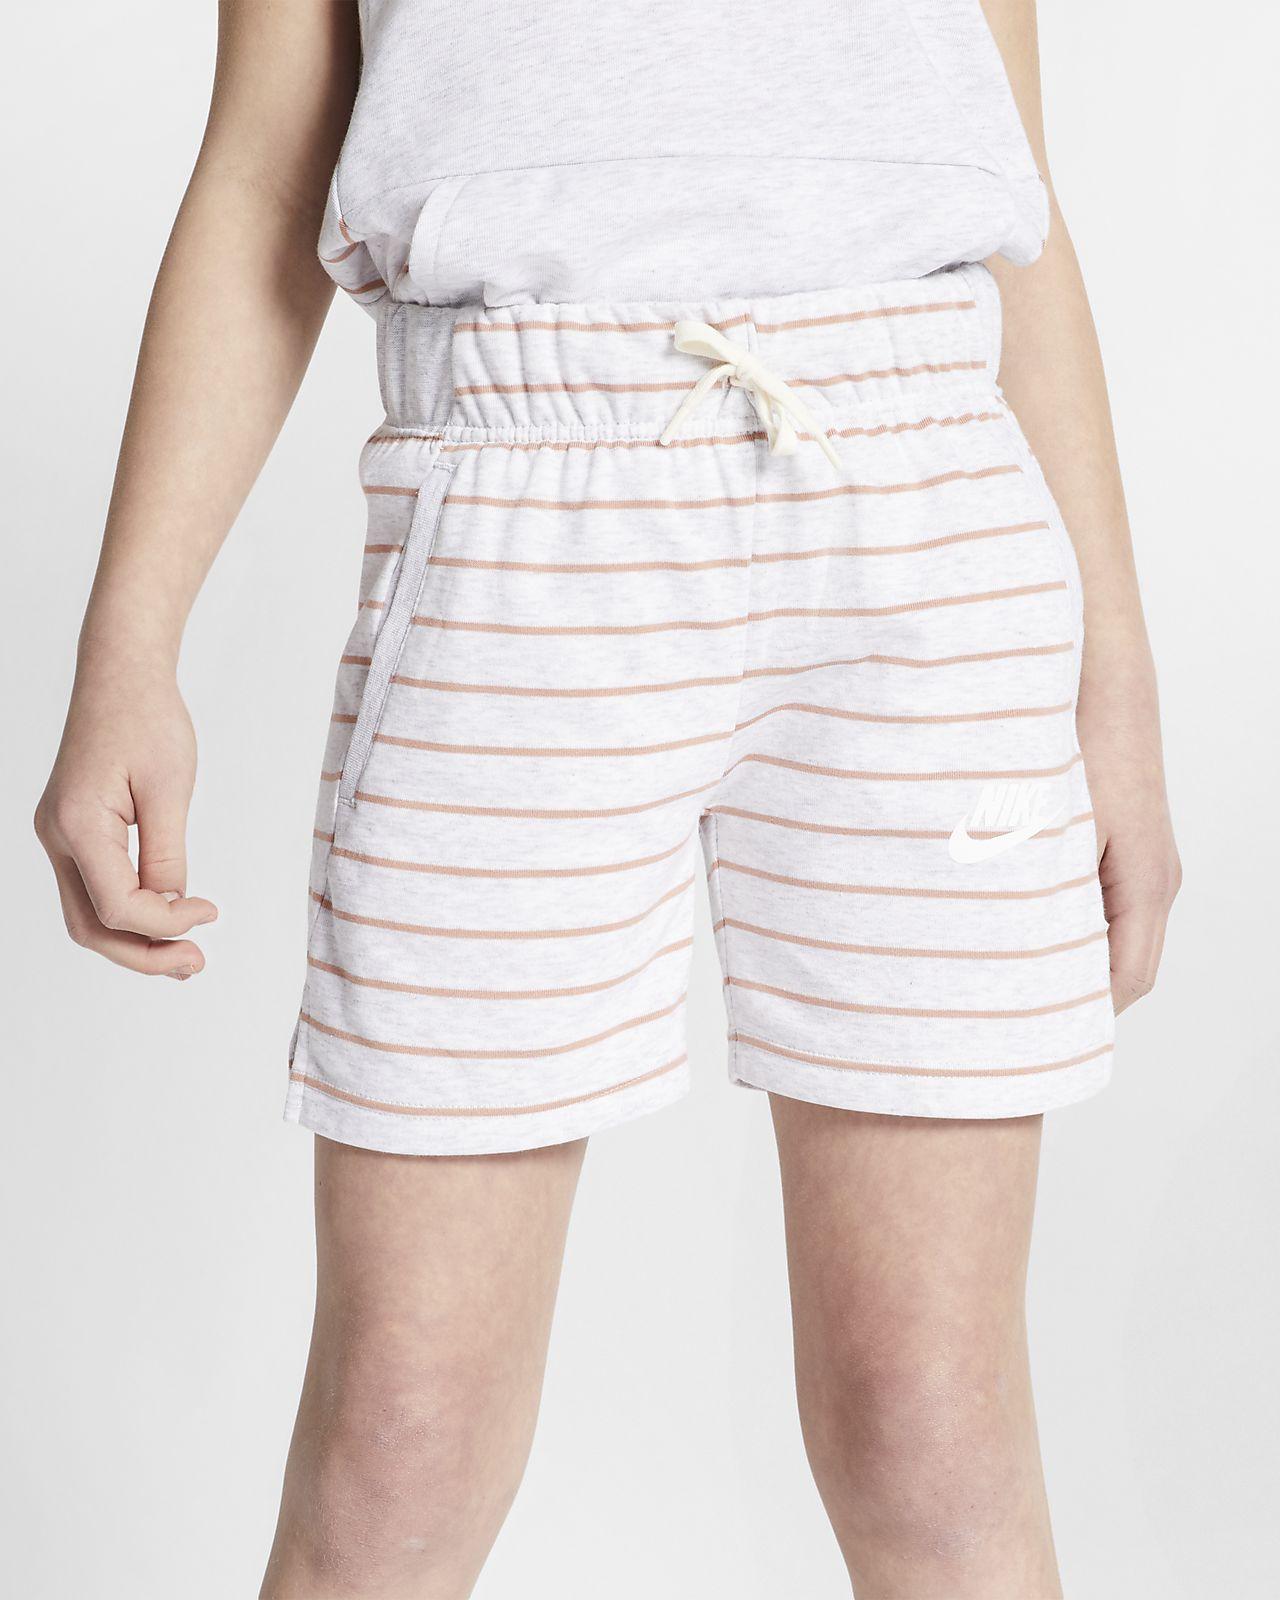 Shorts Nike Sportswear för ungdom (tjejer)